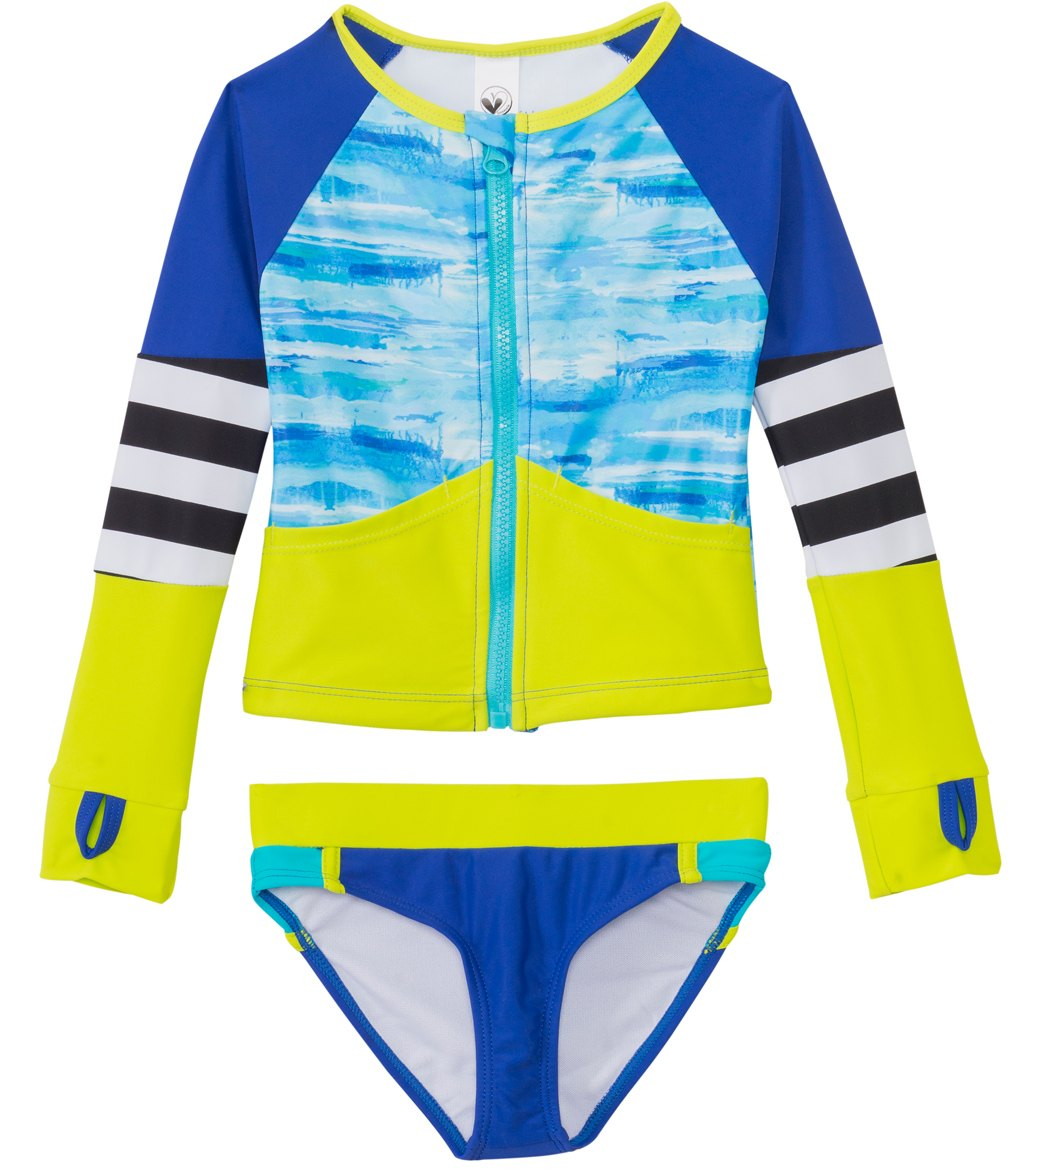 7014e3ddcc Limeapple Swimwear Girls' Hawaii Zip Up Rash Guard Set (4yrs-16yrs ...